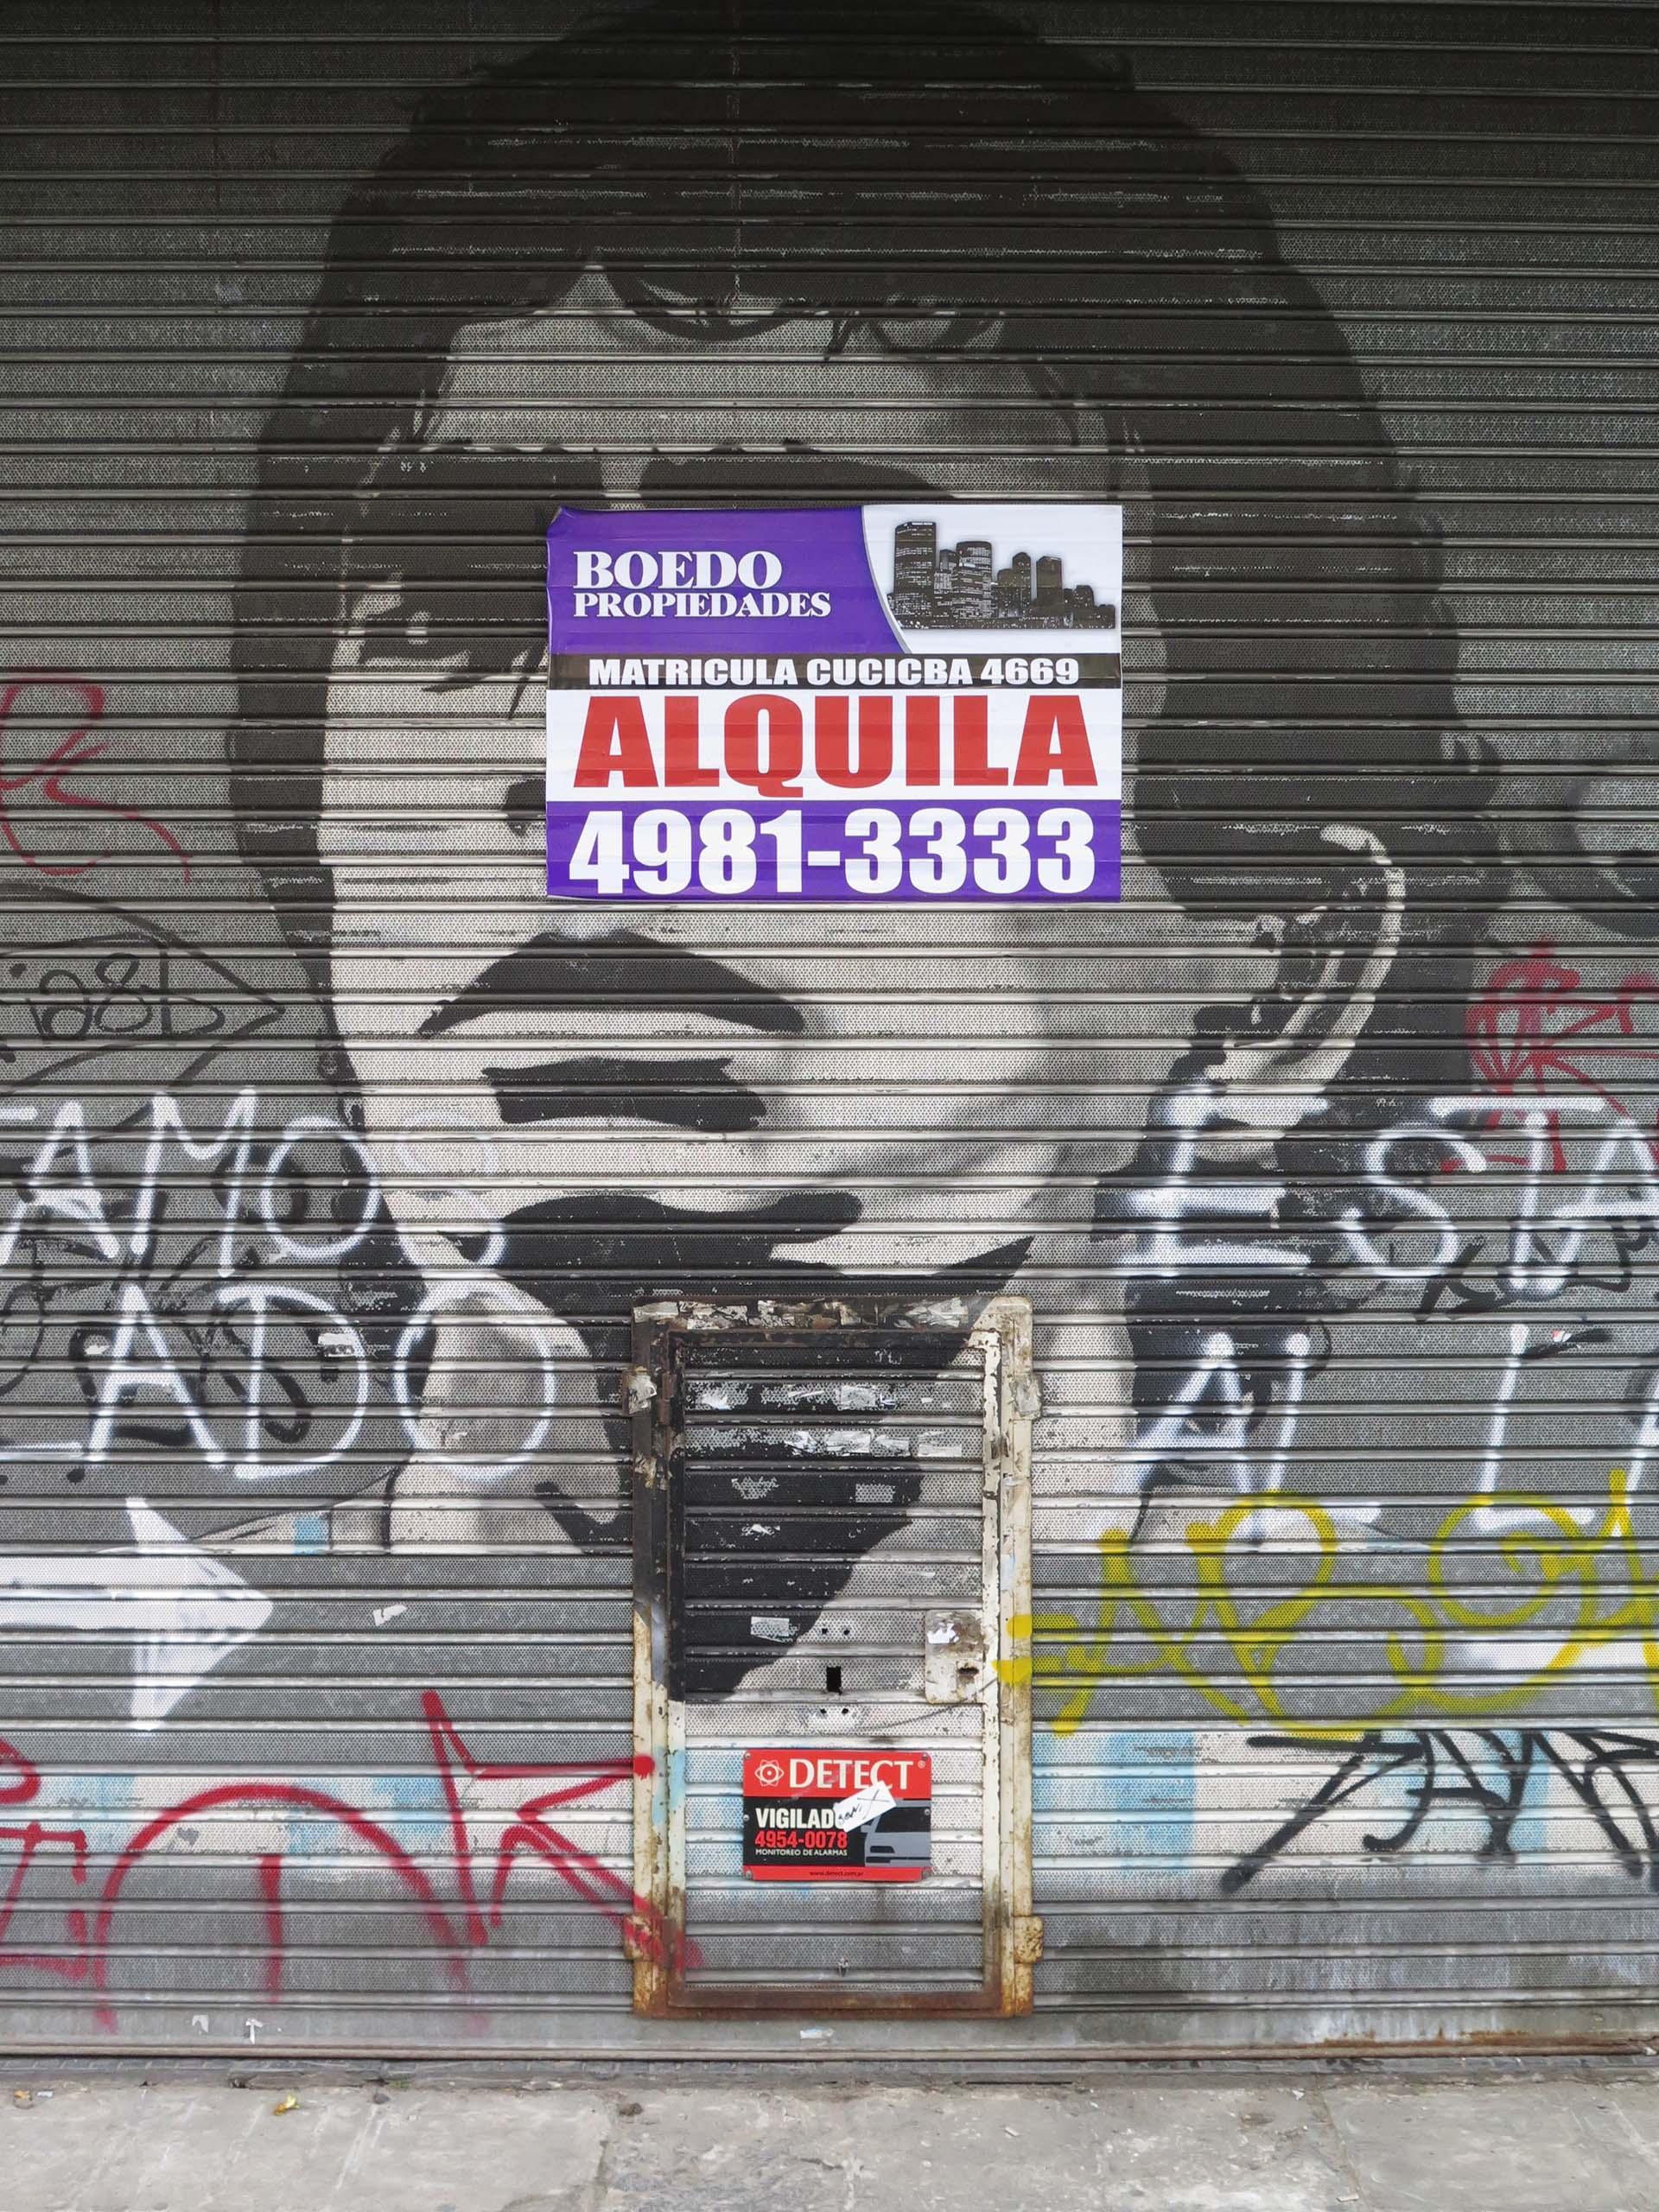 Pinceladas del barrio de Almagro, dos años atrás: